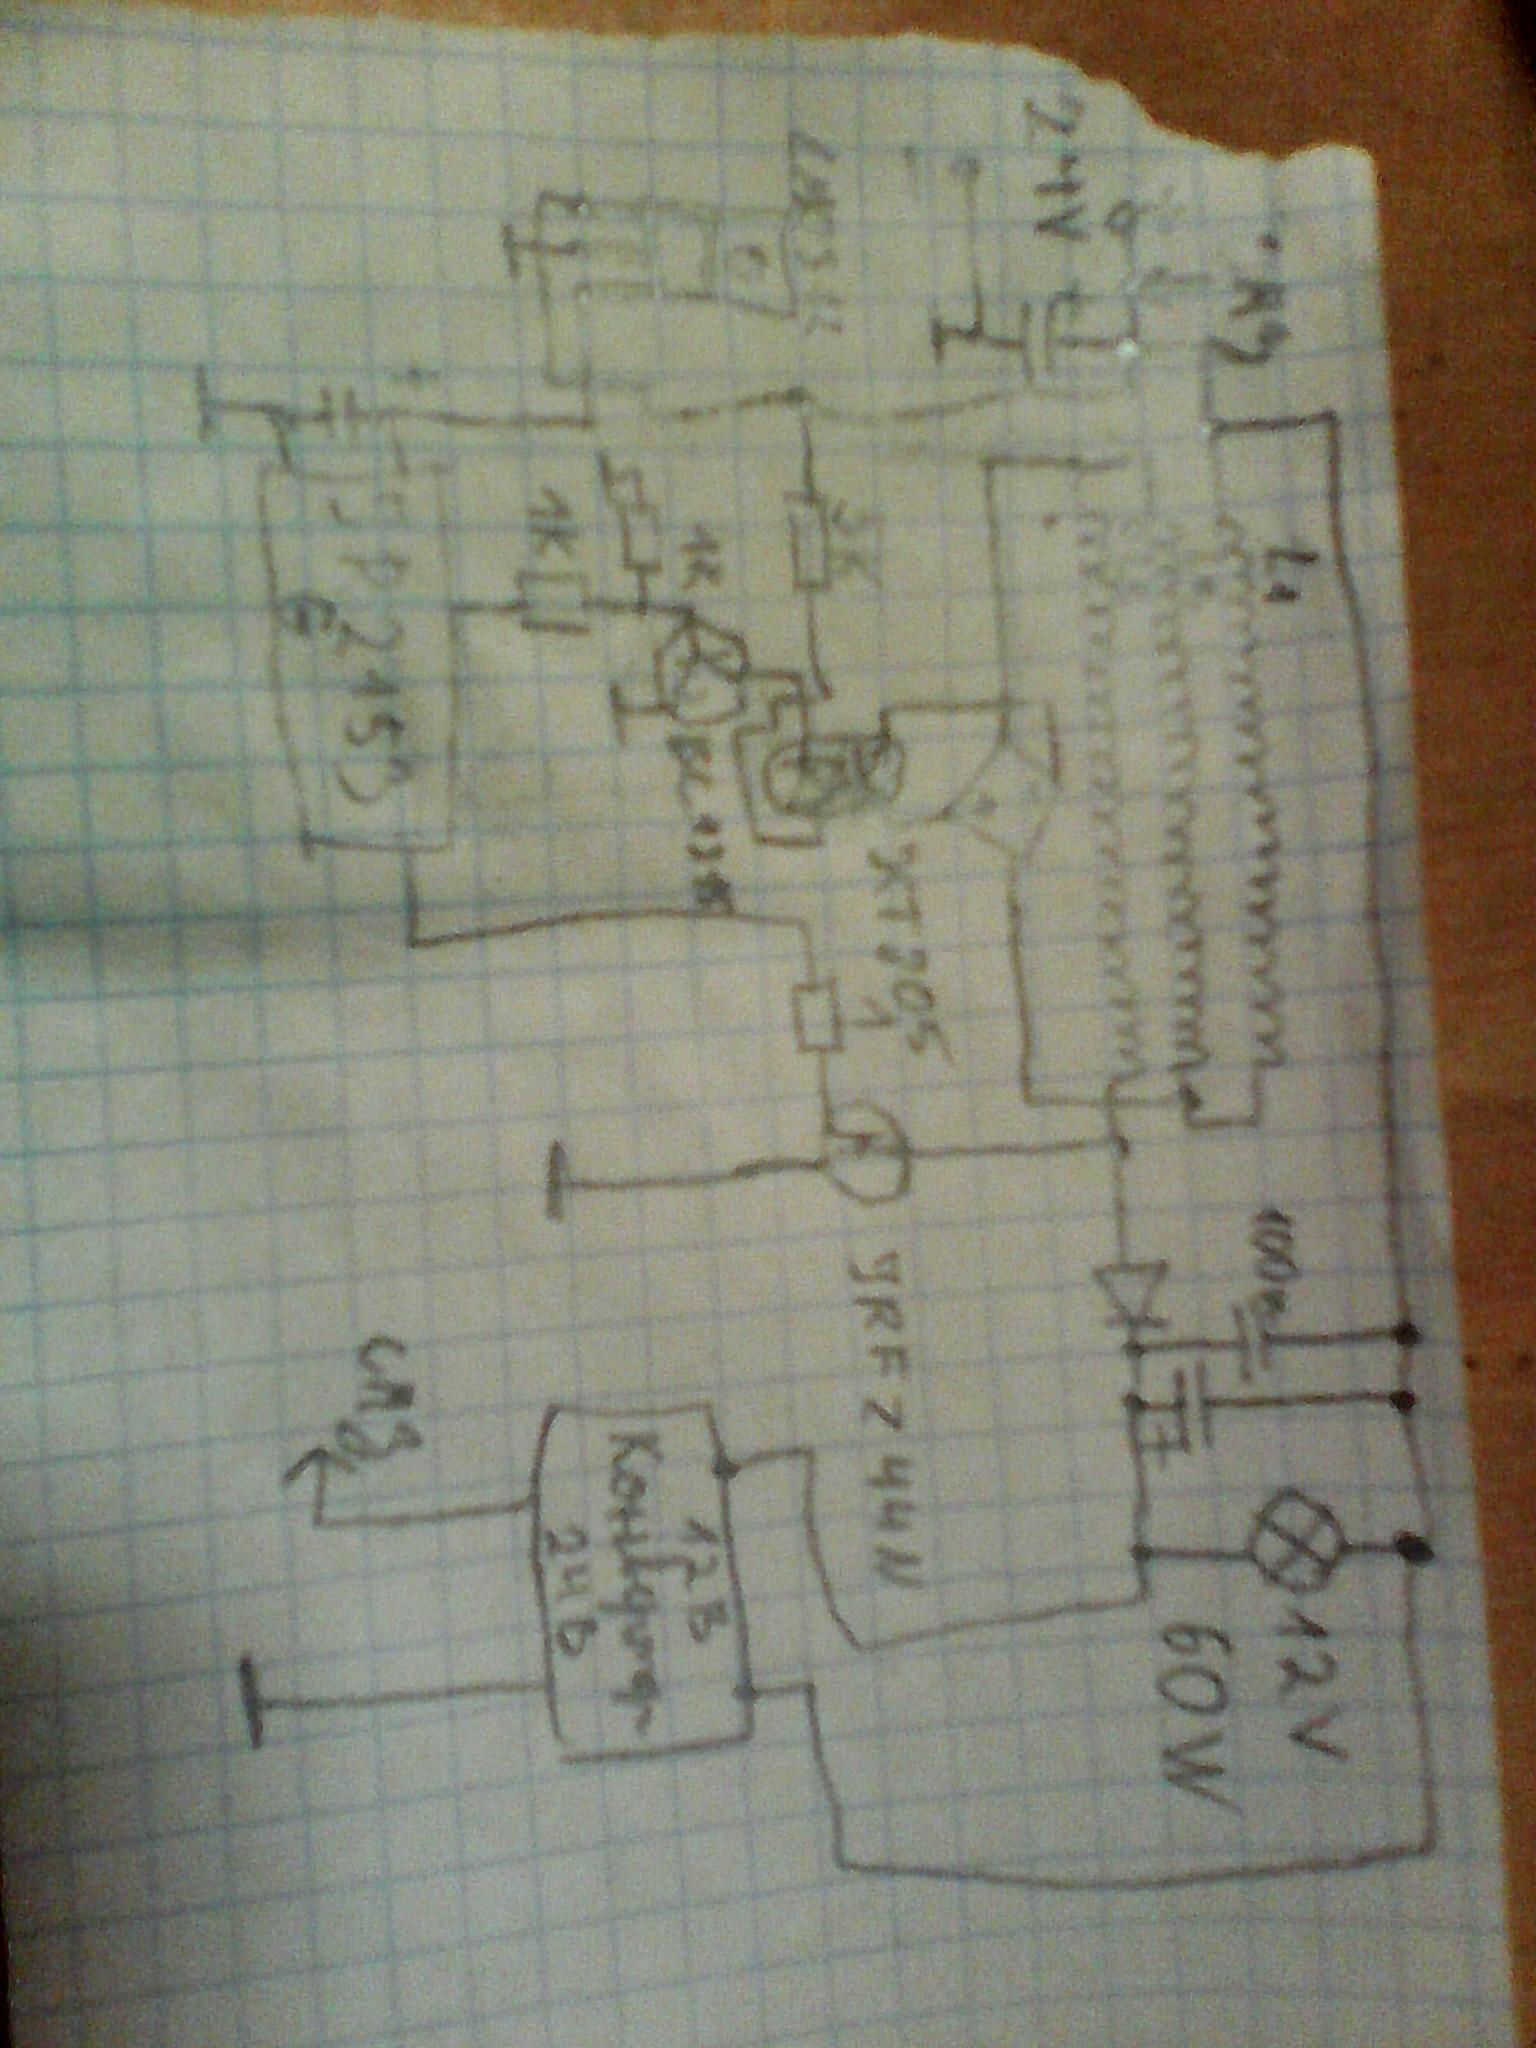 visokochastotniy-pisk-ot-generatora